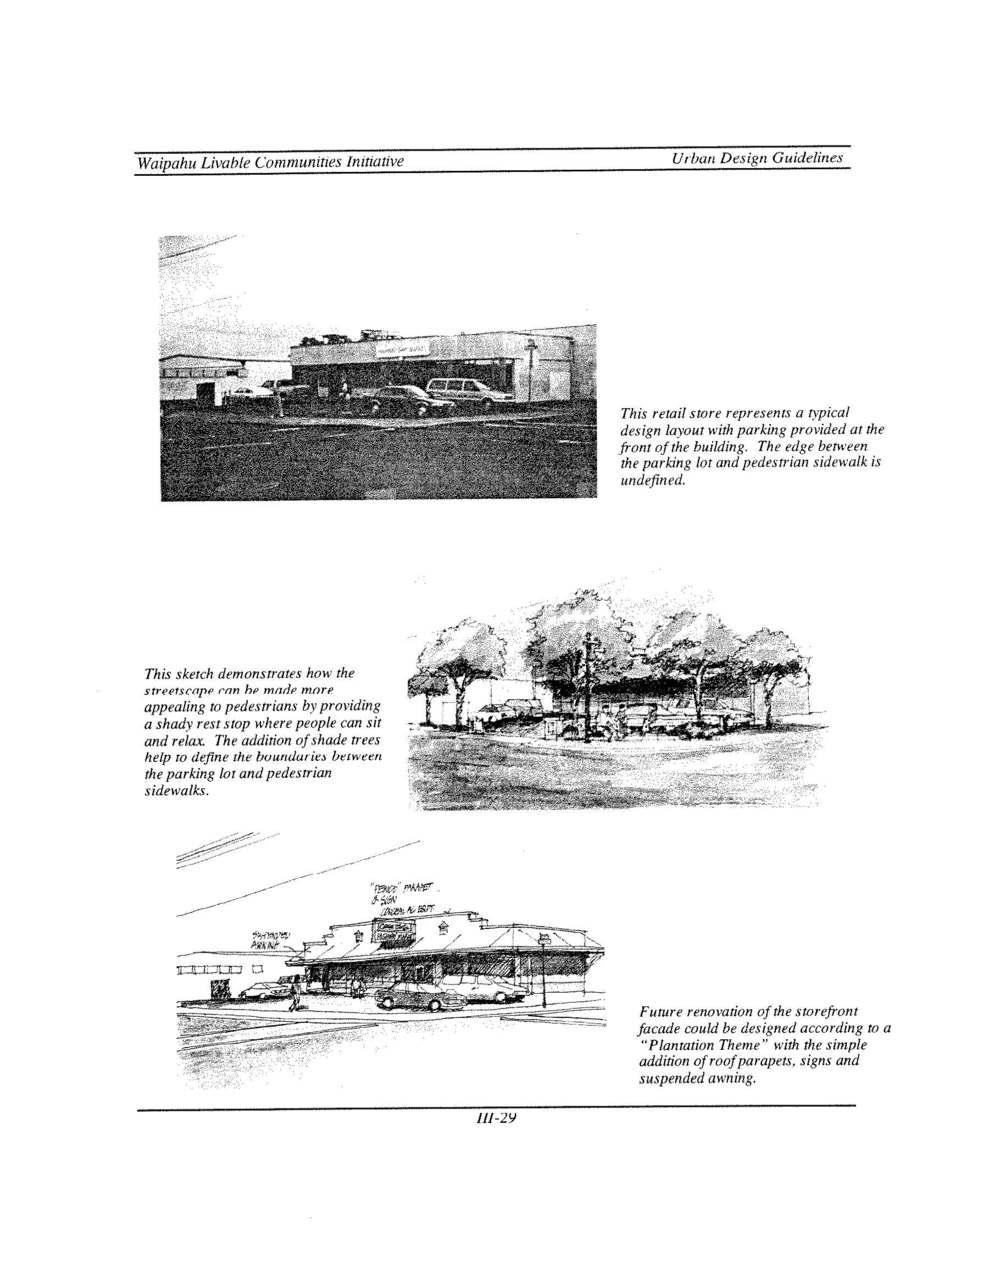 160531_WaipahuLivableCommunities(1998)_Page_119.jpg